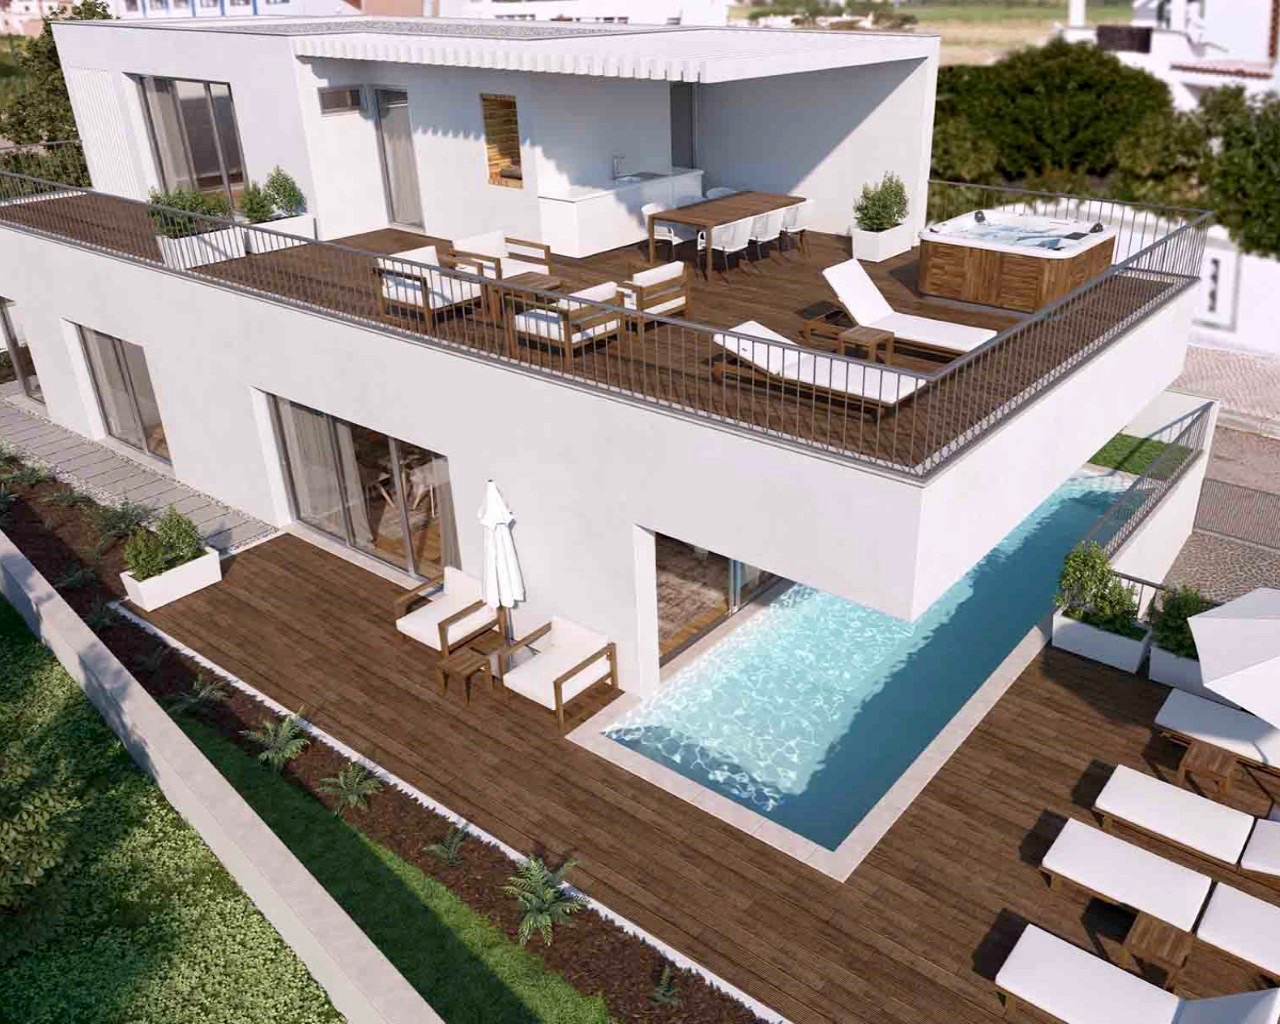 Villa contemporaine de 3 chambres avec piscine individuelle, terrasses à Ferragudo  - 3 Chambres